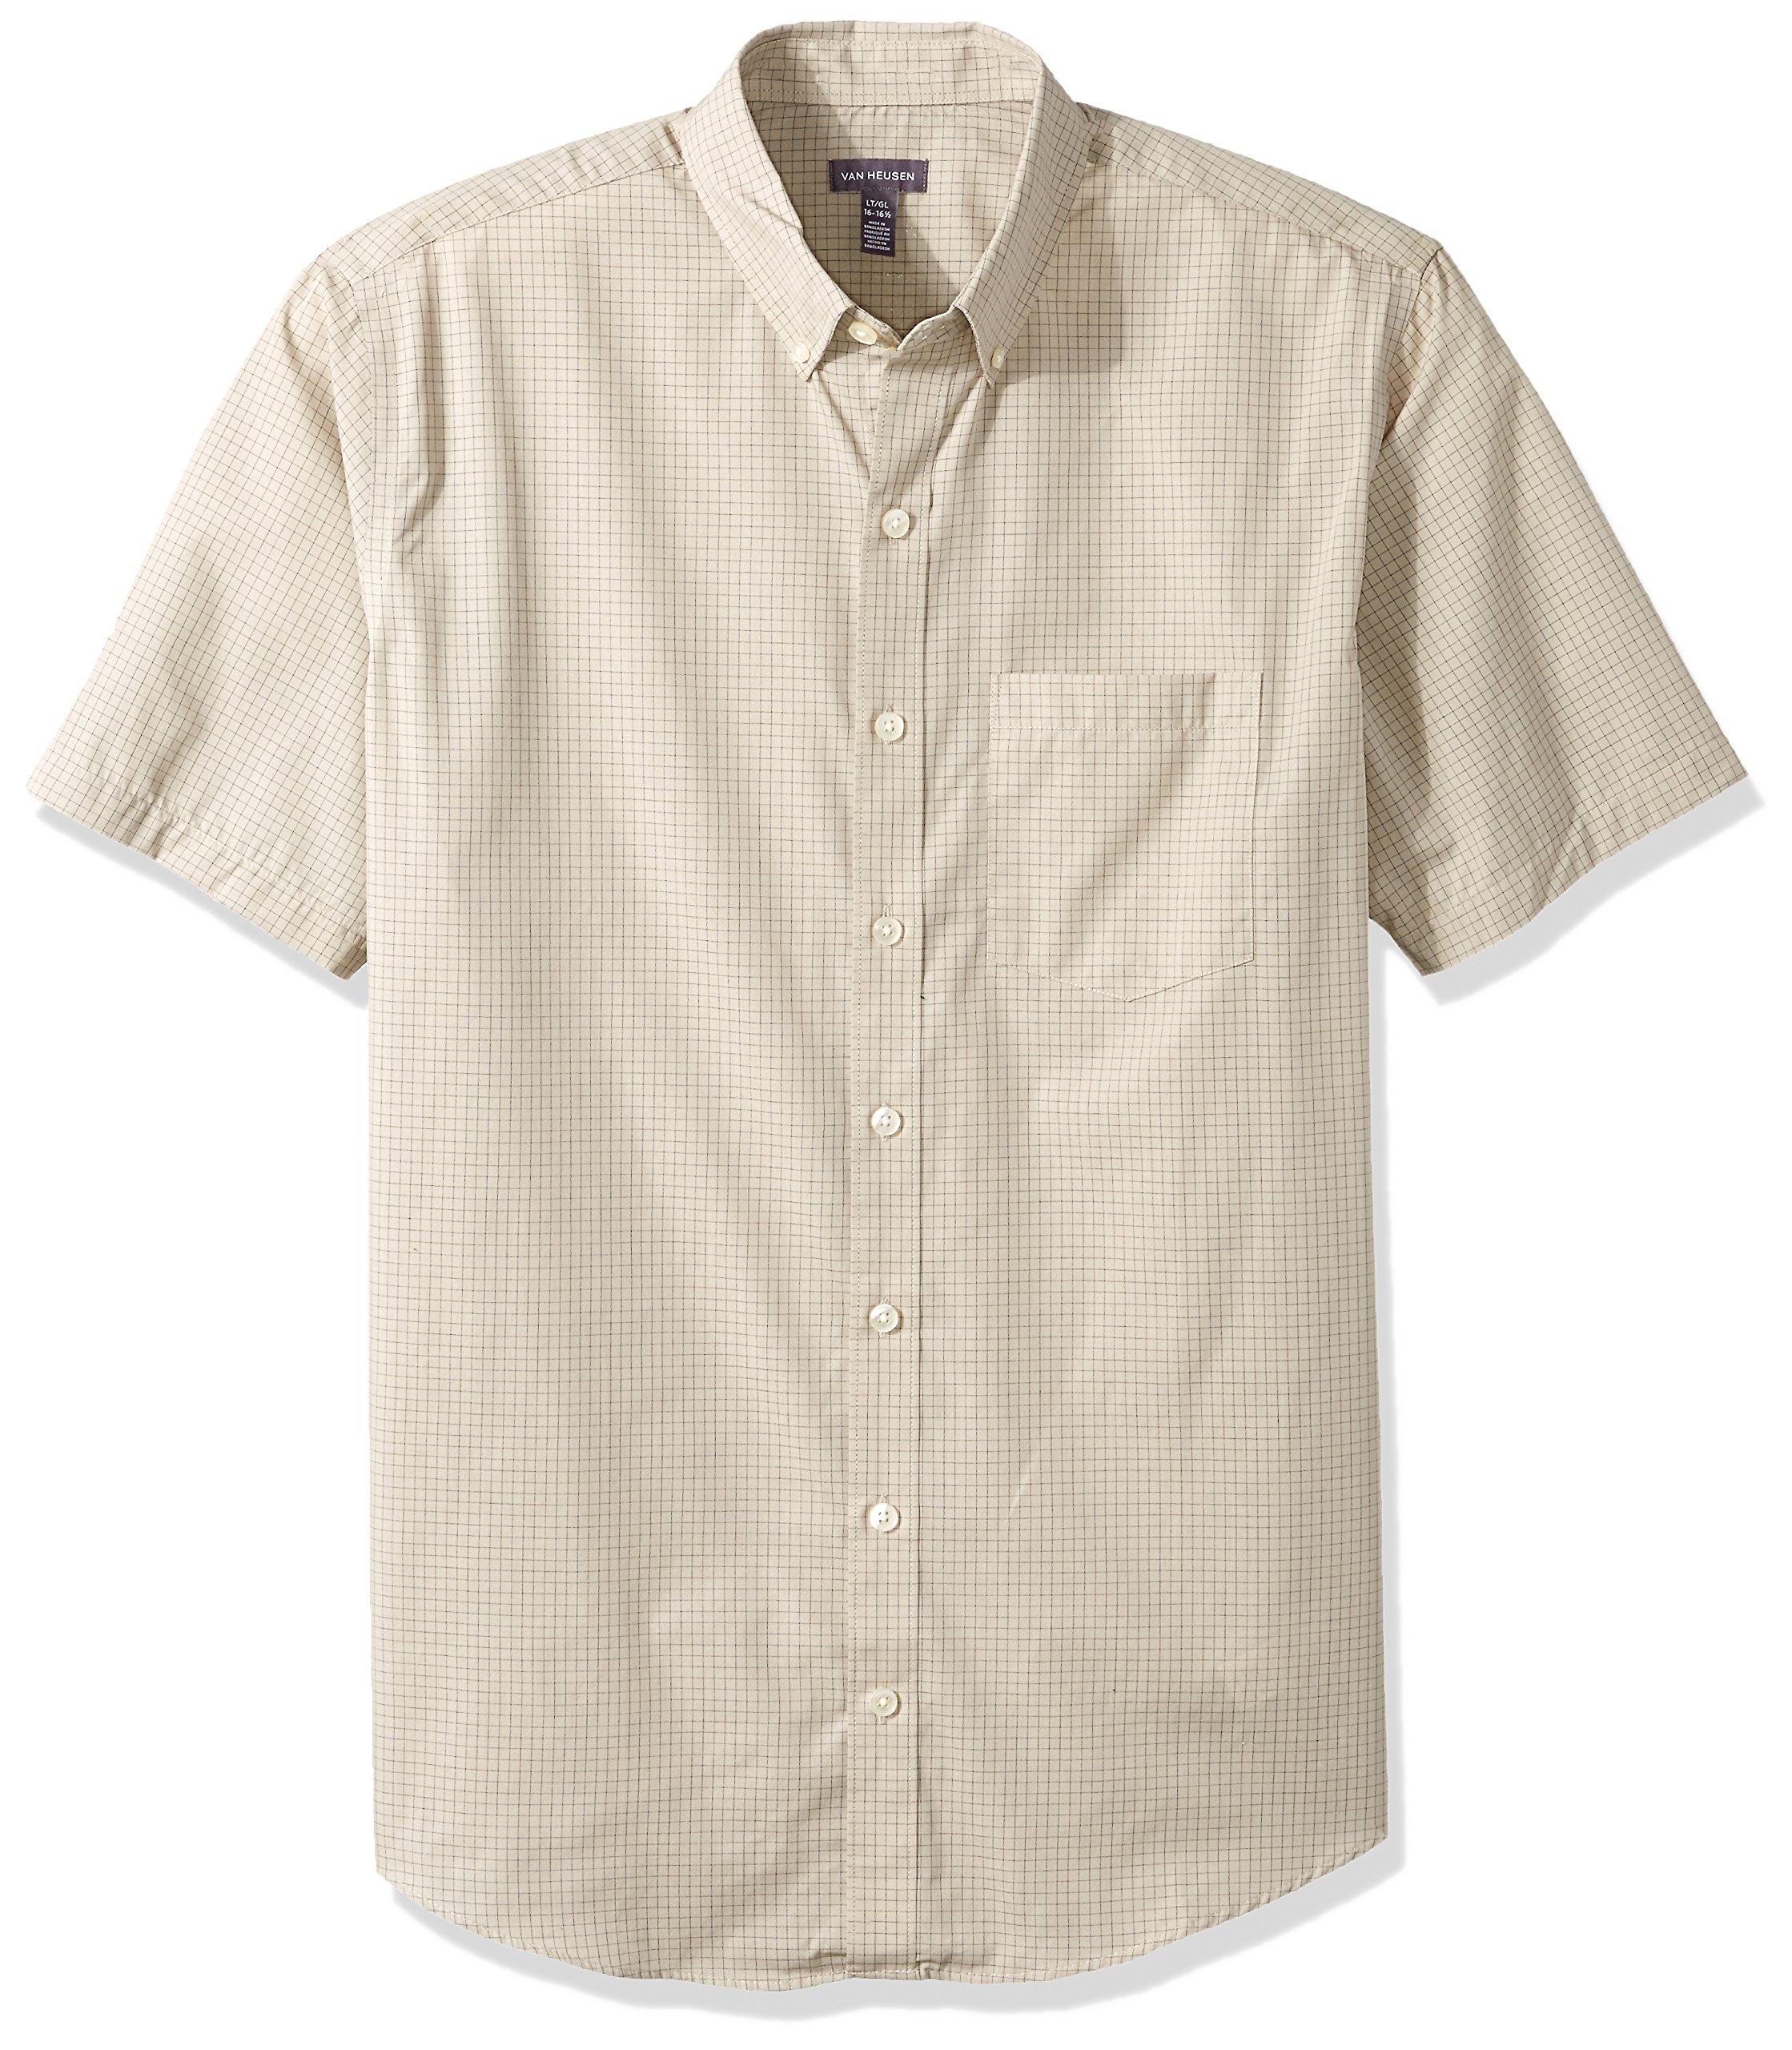 Van Heusen Men's Size Big Wrinkle Free Short Sleeve Button Down Shirt, Aluminum, 4X-Large Tall